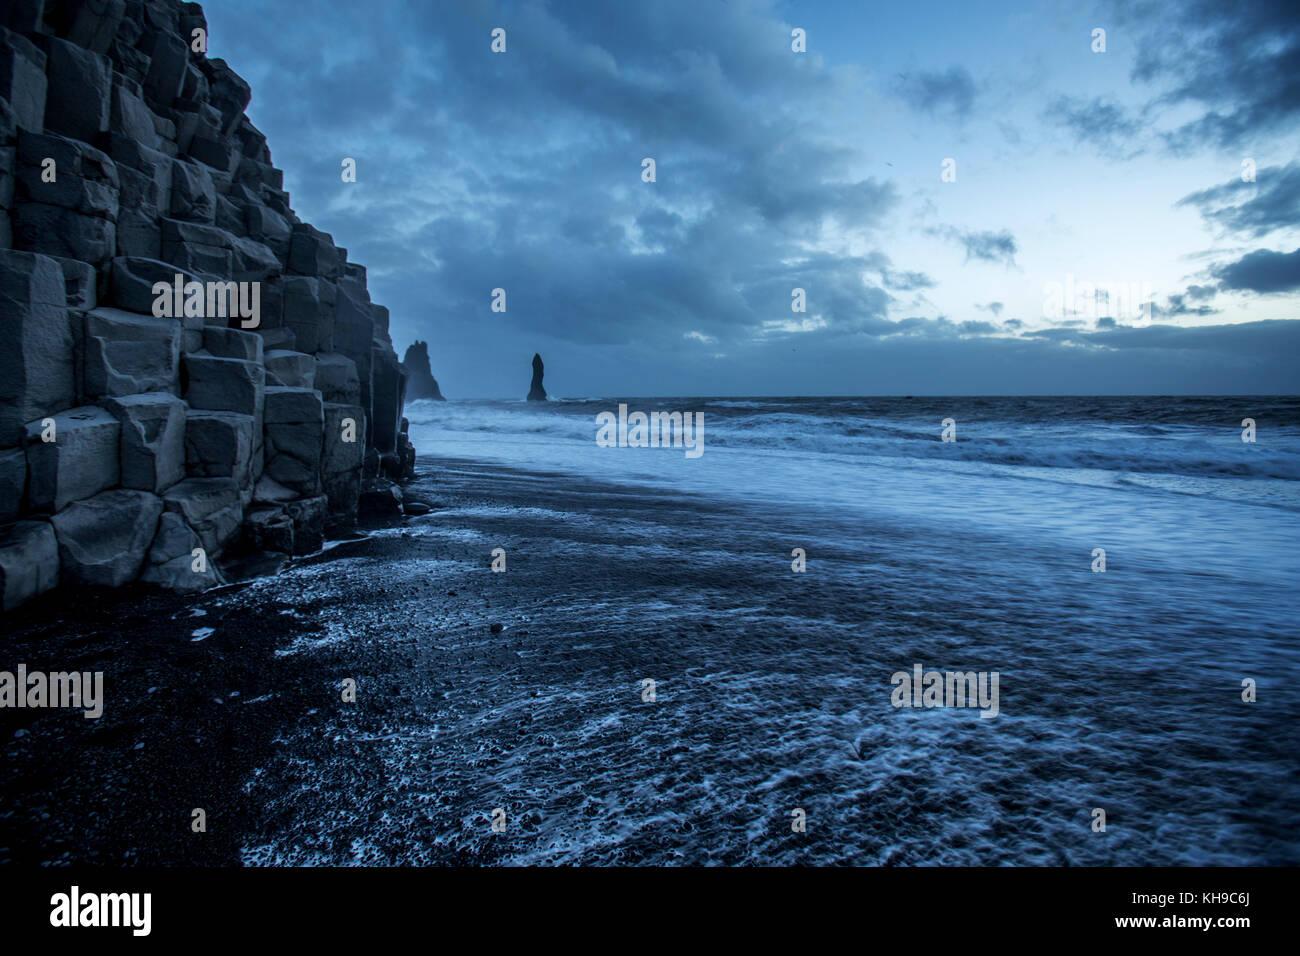 Reynisfjara black beach on the south coast of Iceland - Stock Image